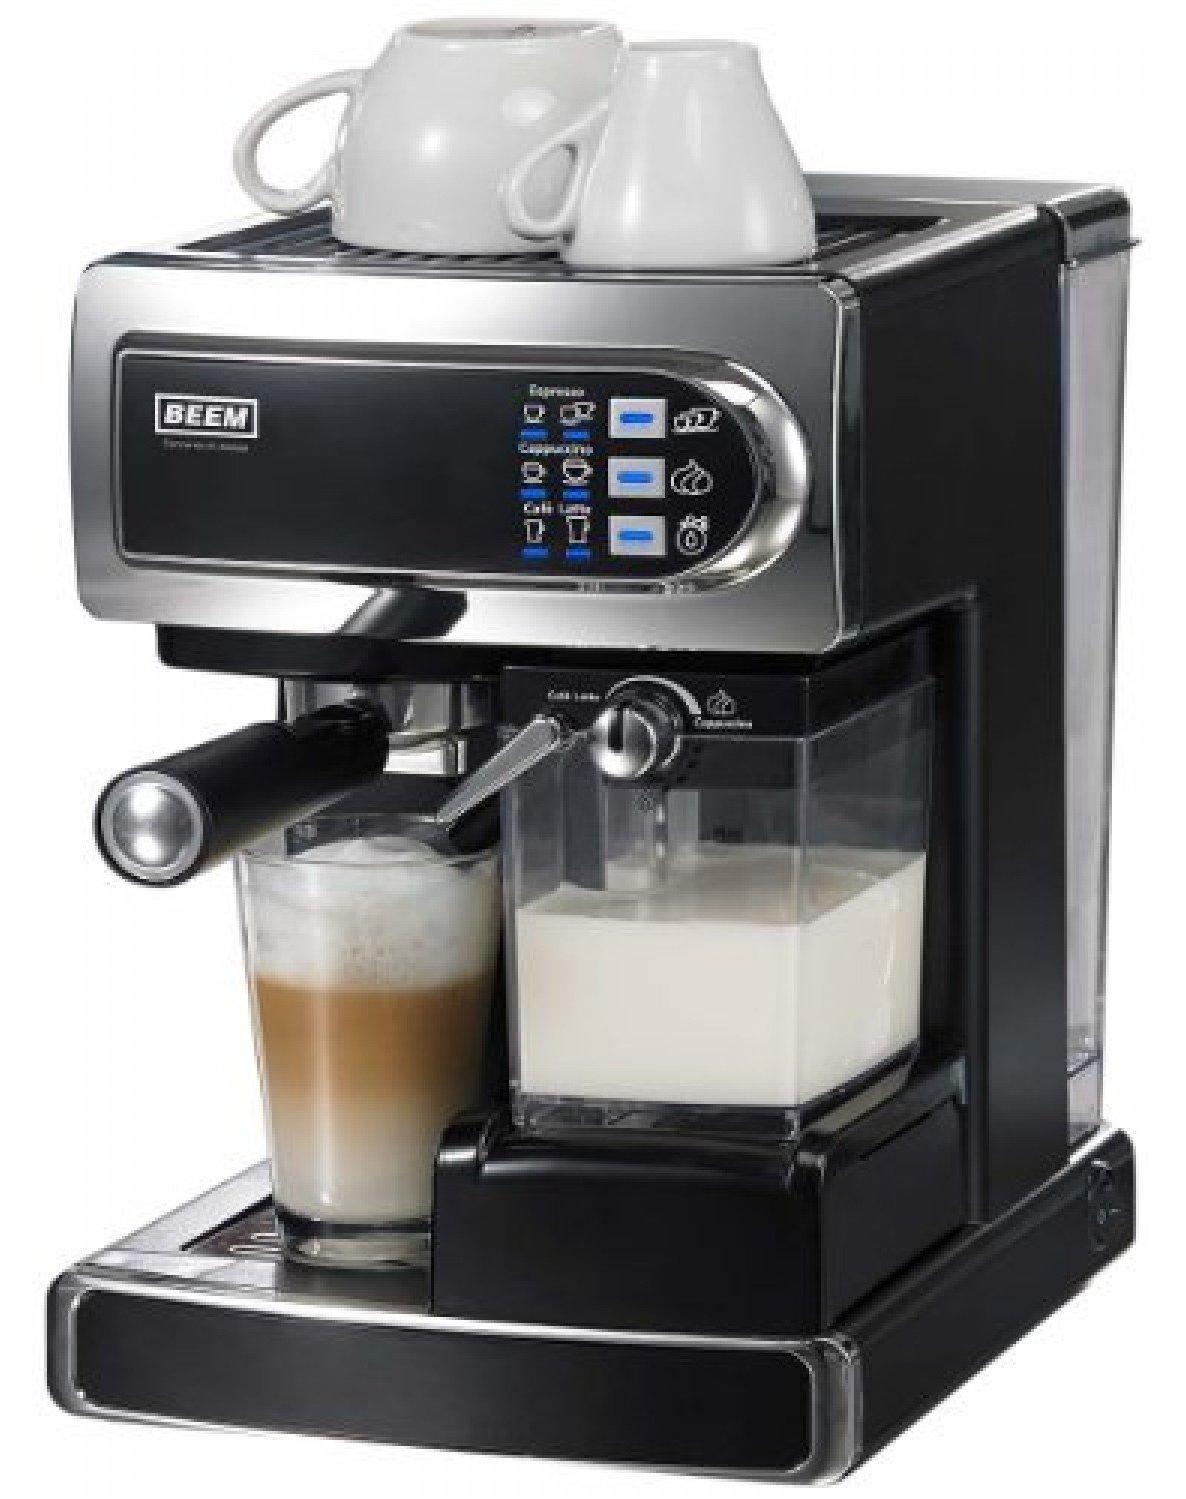 Comment choisir sa machine caf - Quelle machine a cafe automatique choisir ...